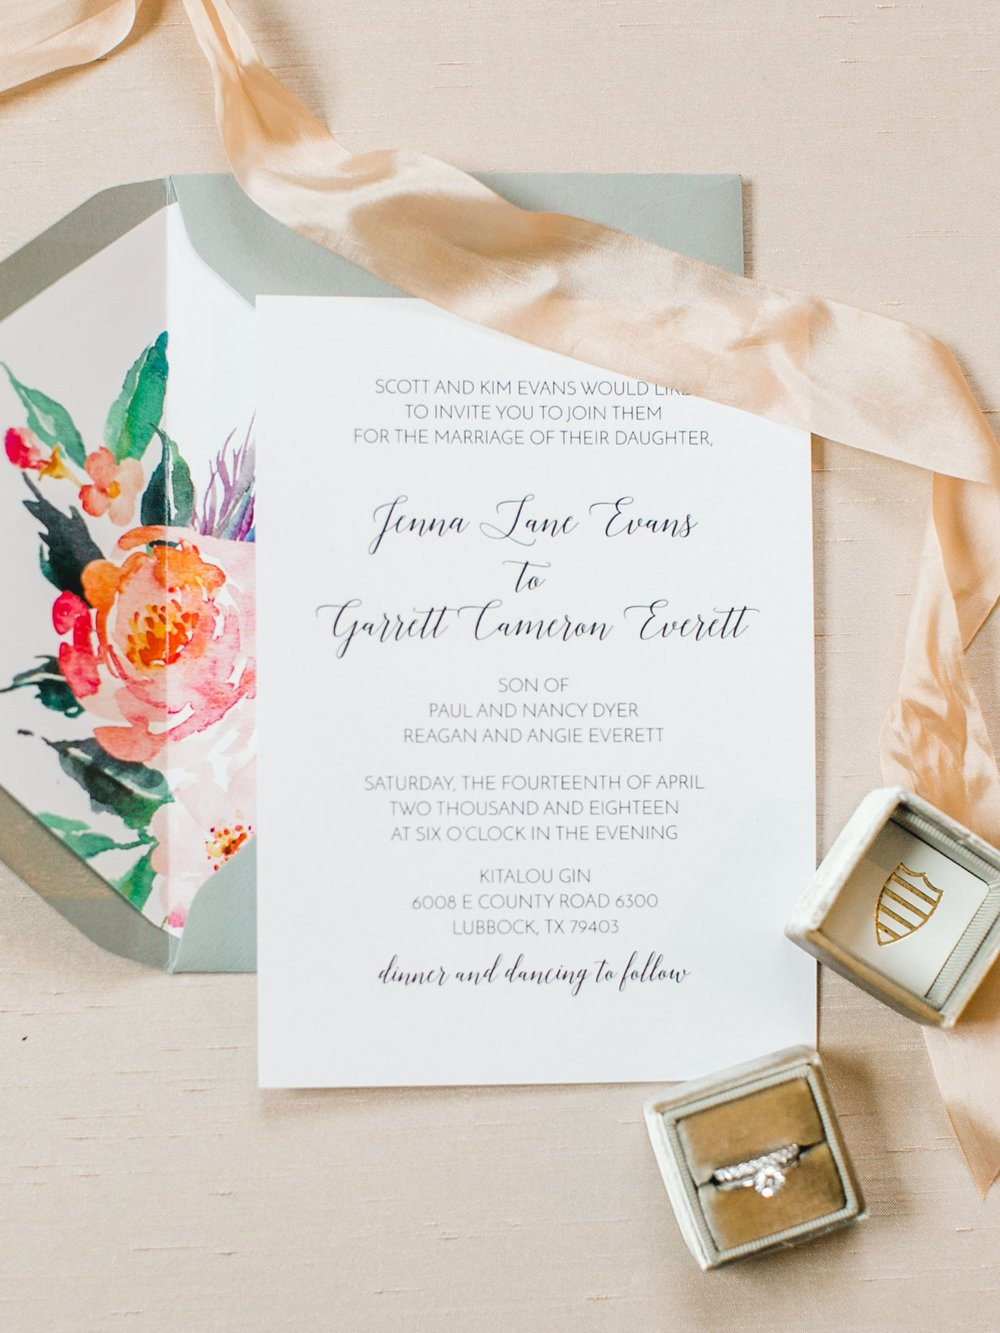 Jenna-and-garrett-Everett-kitalou-gin-lubbock-wedding-dayspring-designs-lubbock-wedding-photographer_0003.jpg